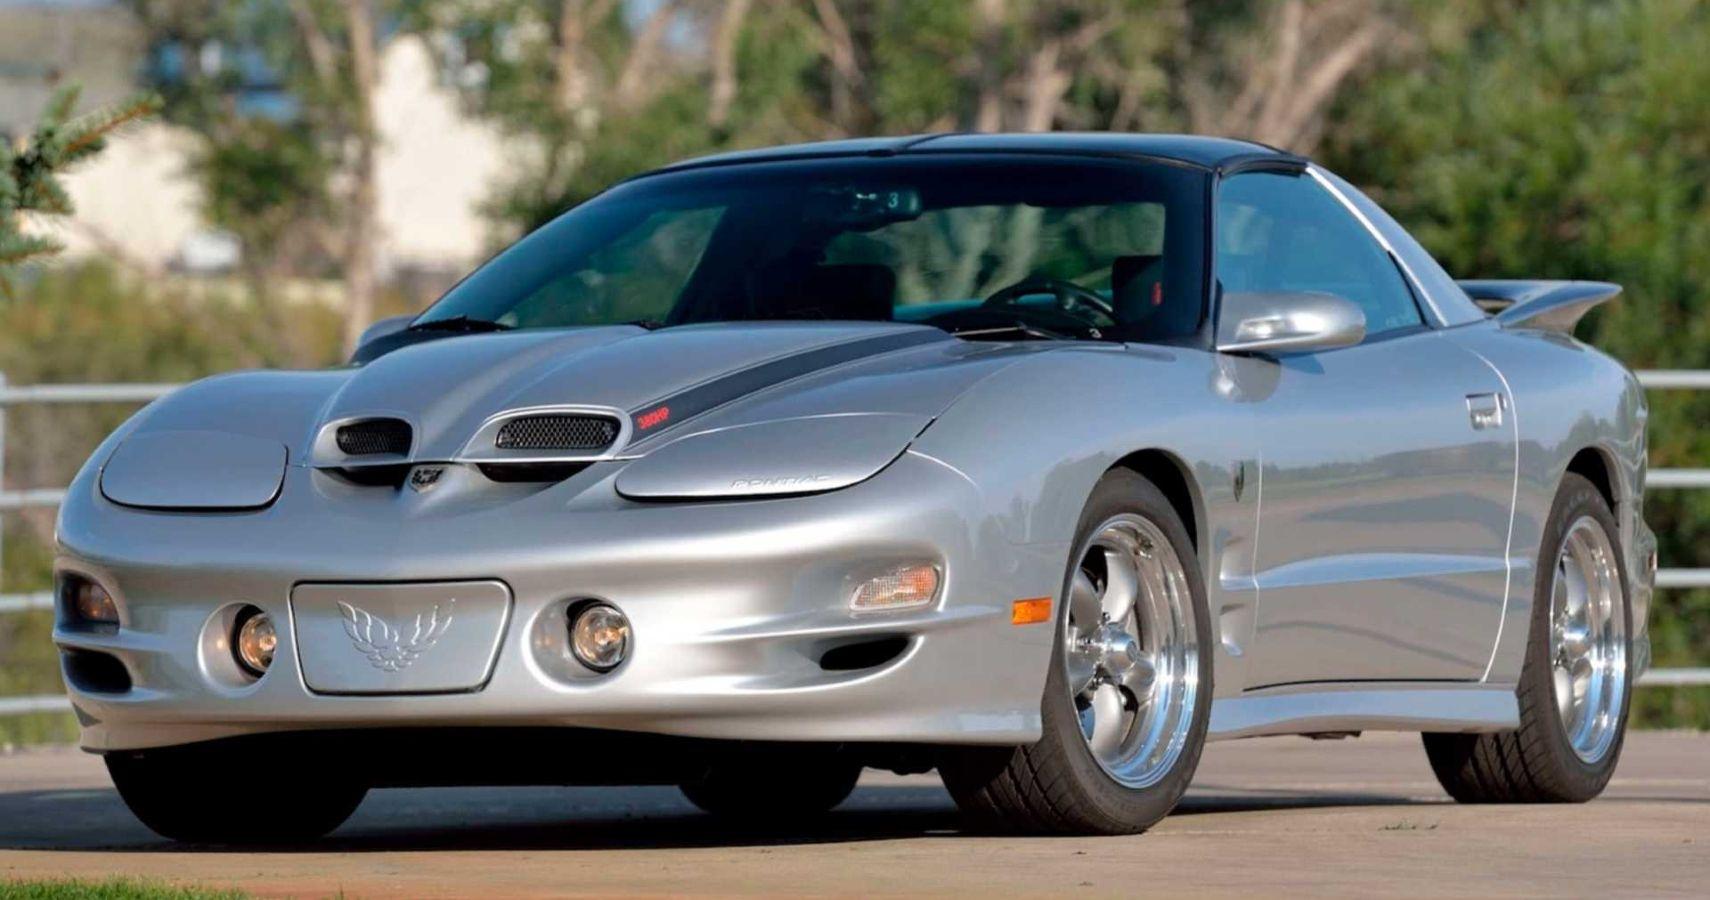 Rare Pontiac Trans Am GMMG Blackbird Year One Edition For Sale On Mecum